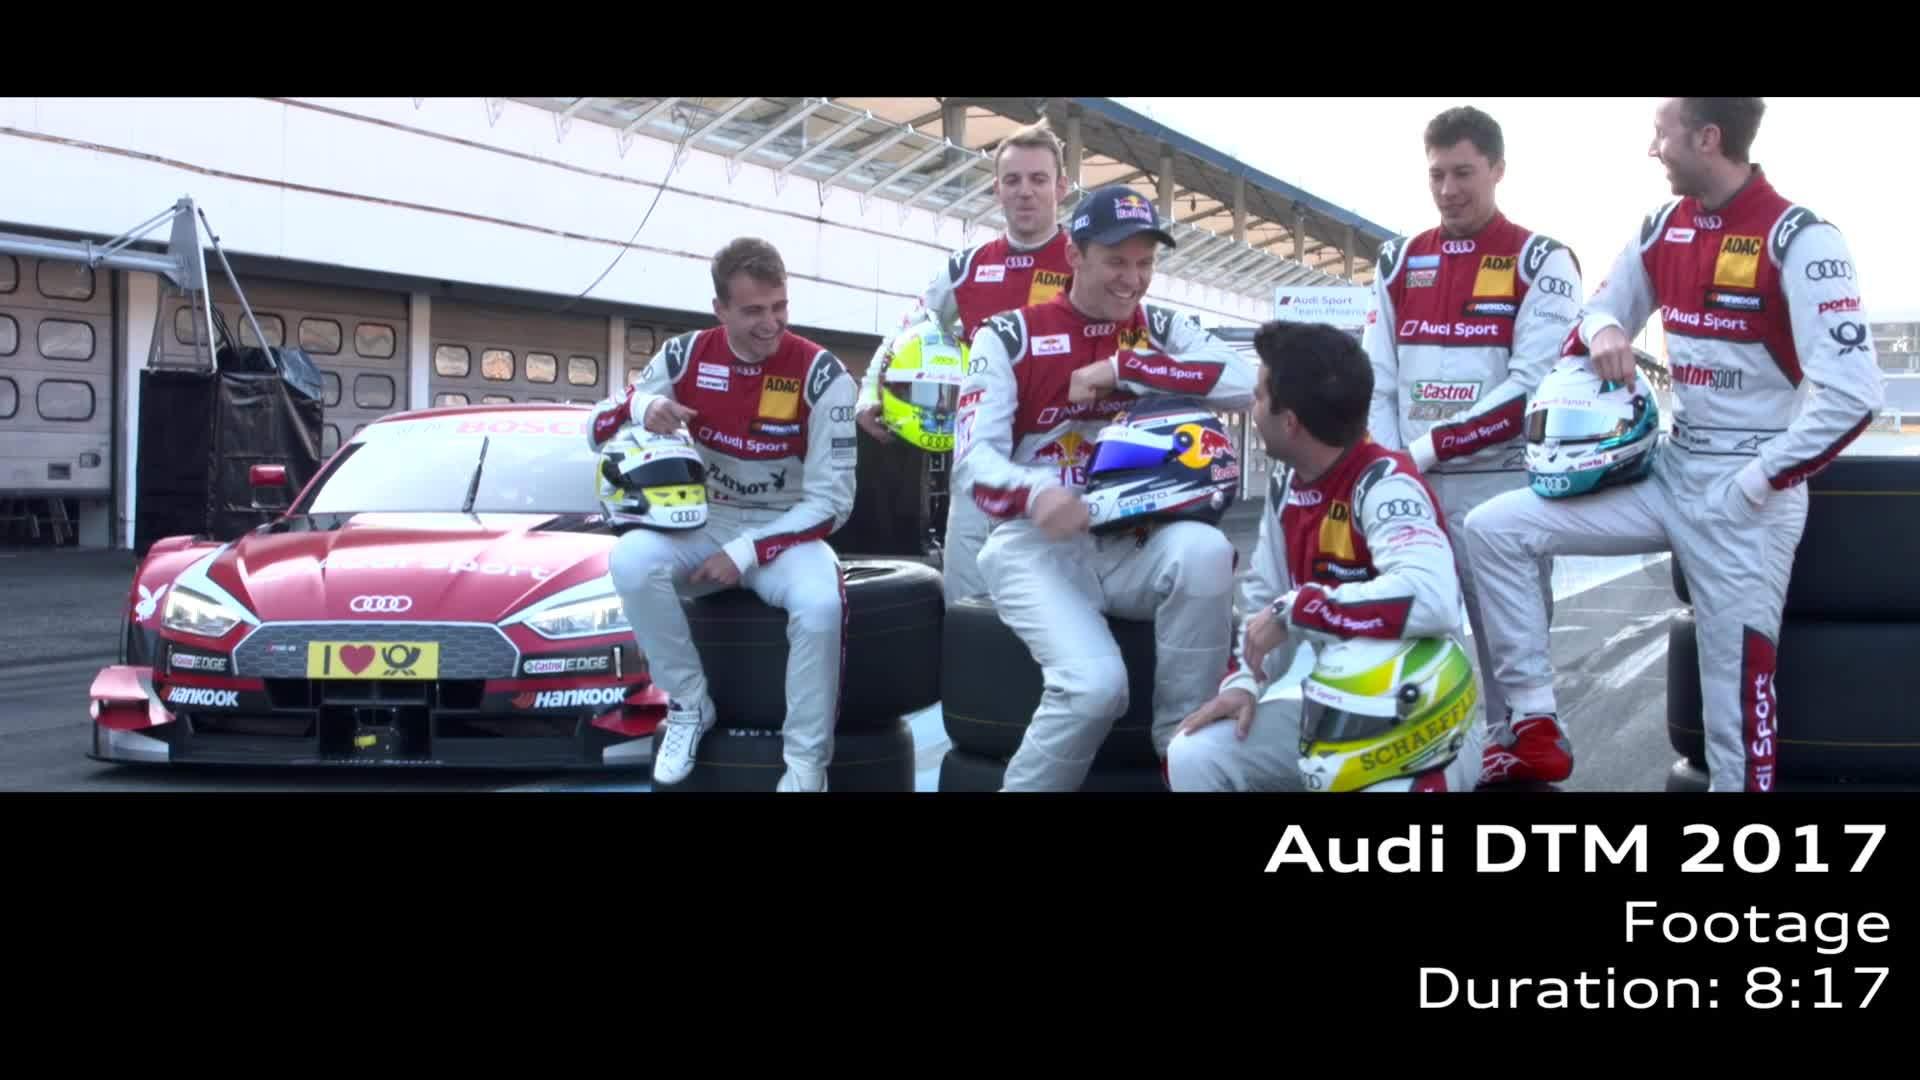 Audi DTM 2017 - Footage